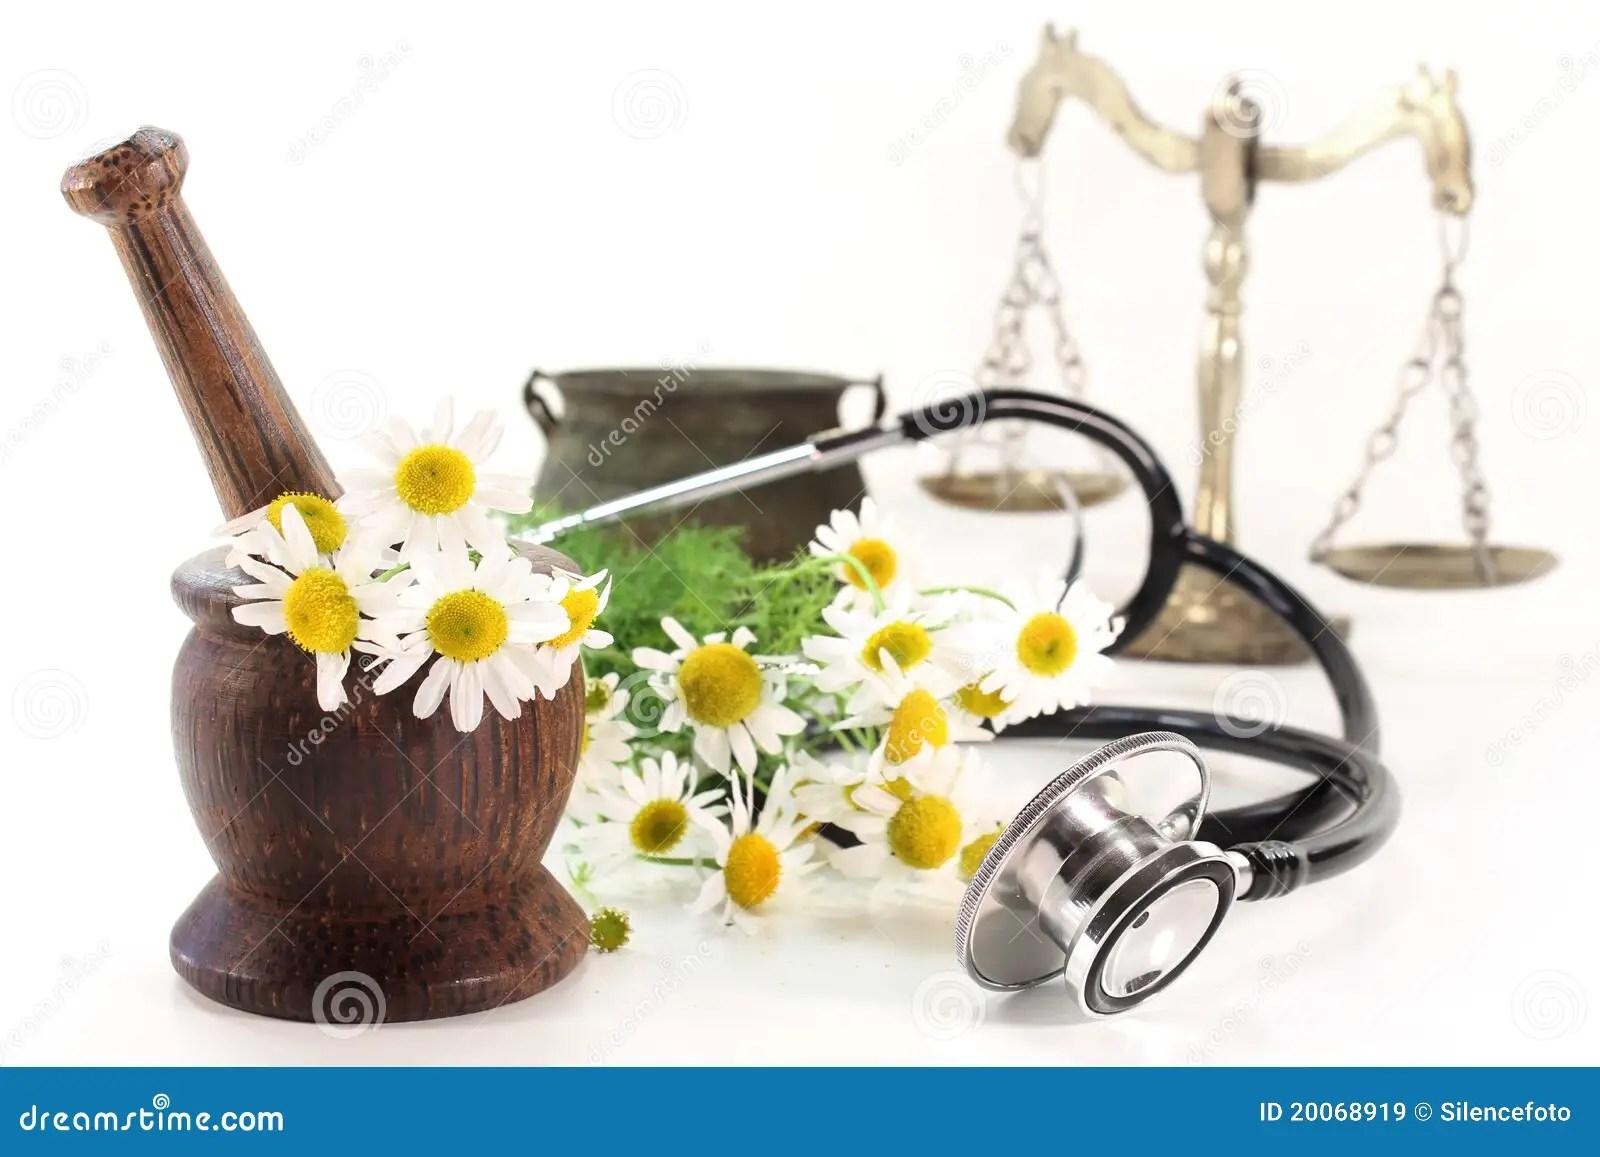 Natural Medicine Stock Image Image Of Plants Homeopathy